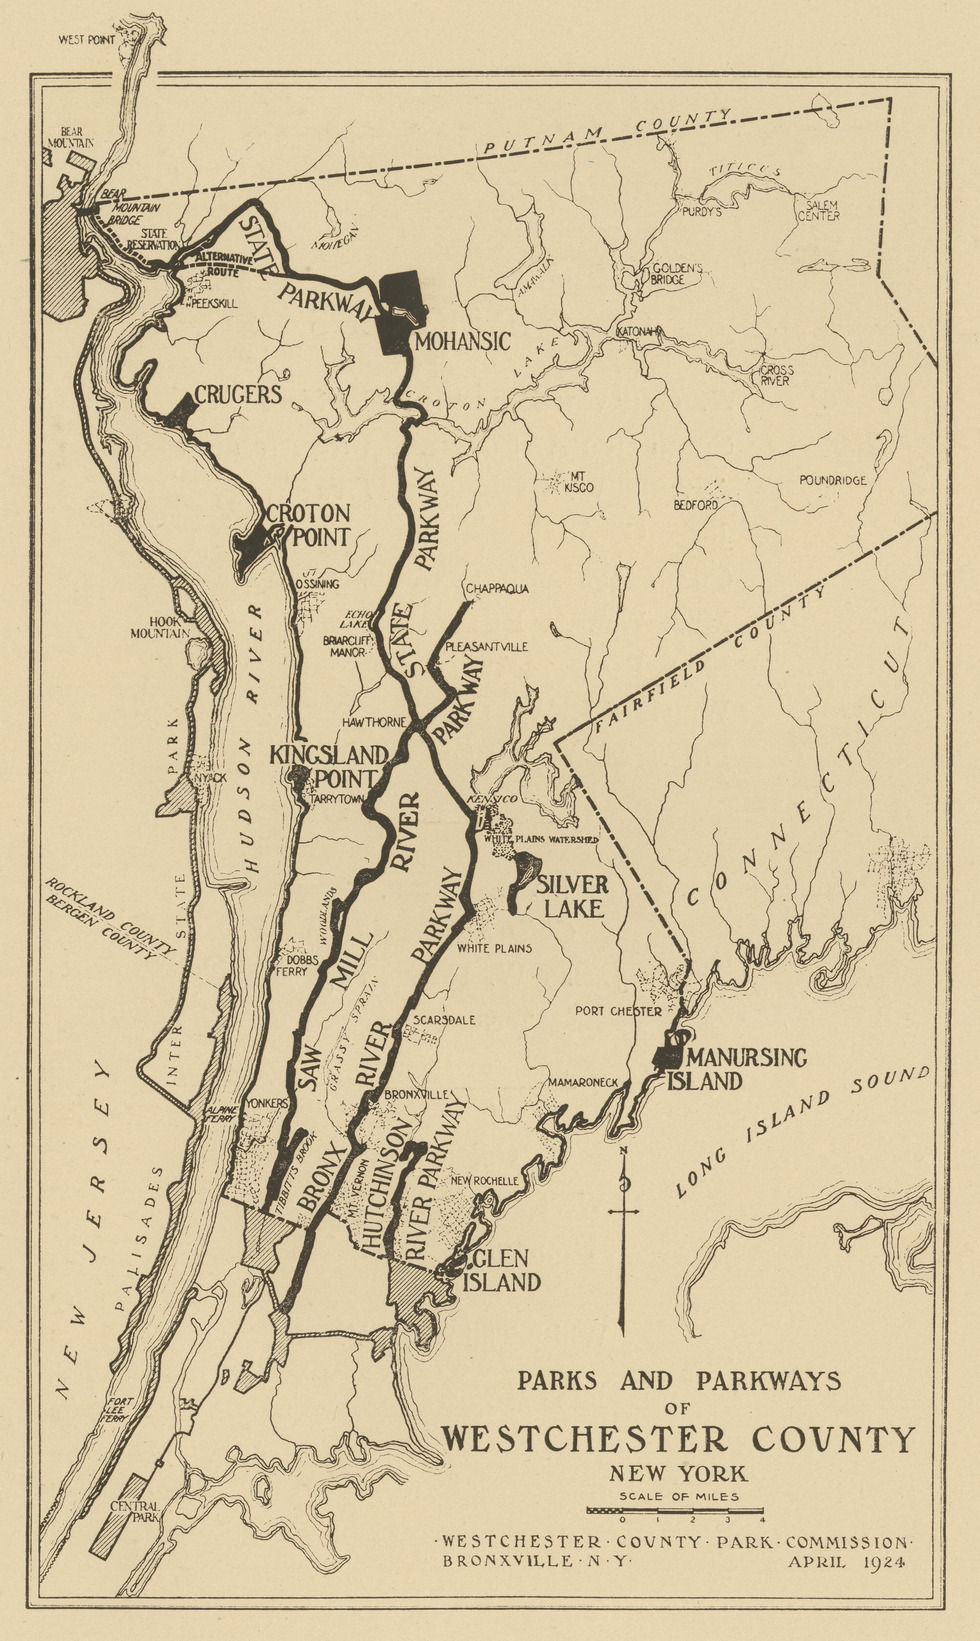 Westchester-parks-map-1924